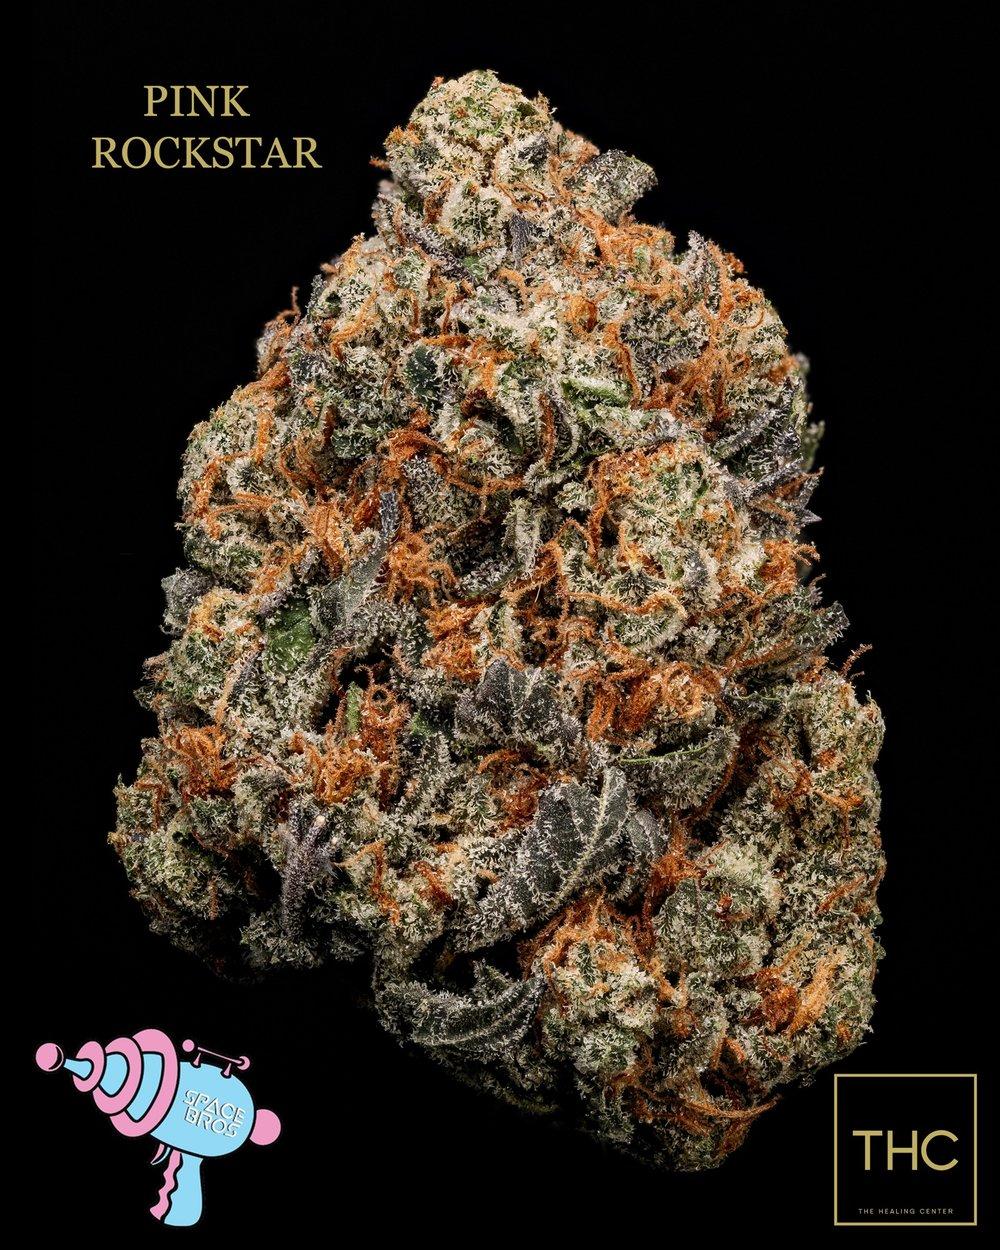 Pink Rockstar Space Bros THC.jpg